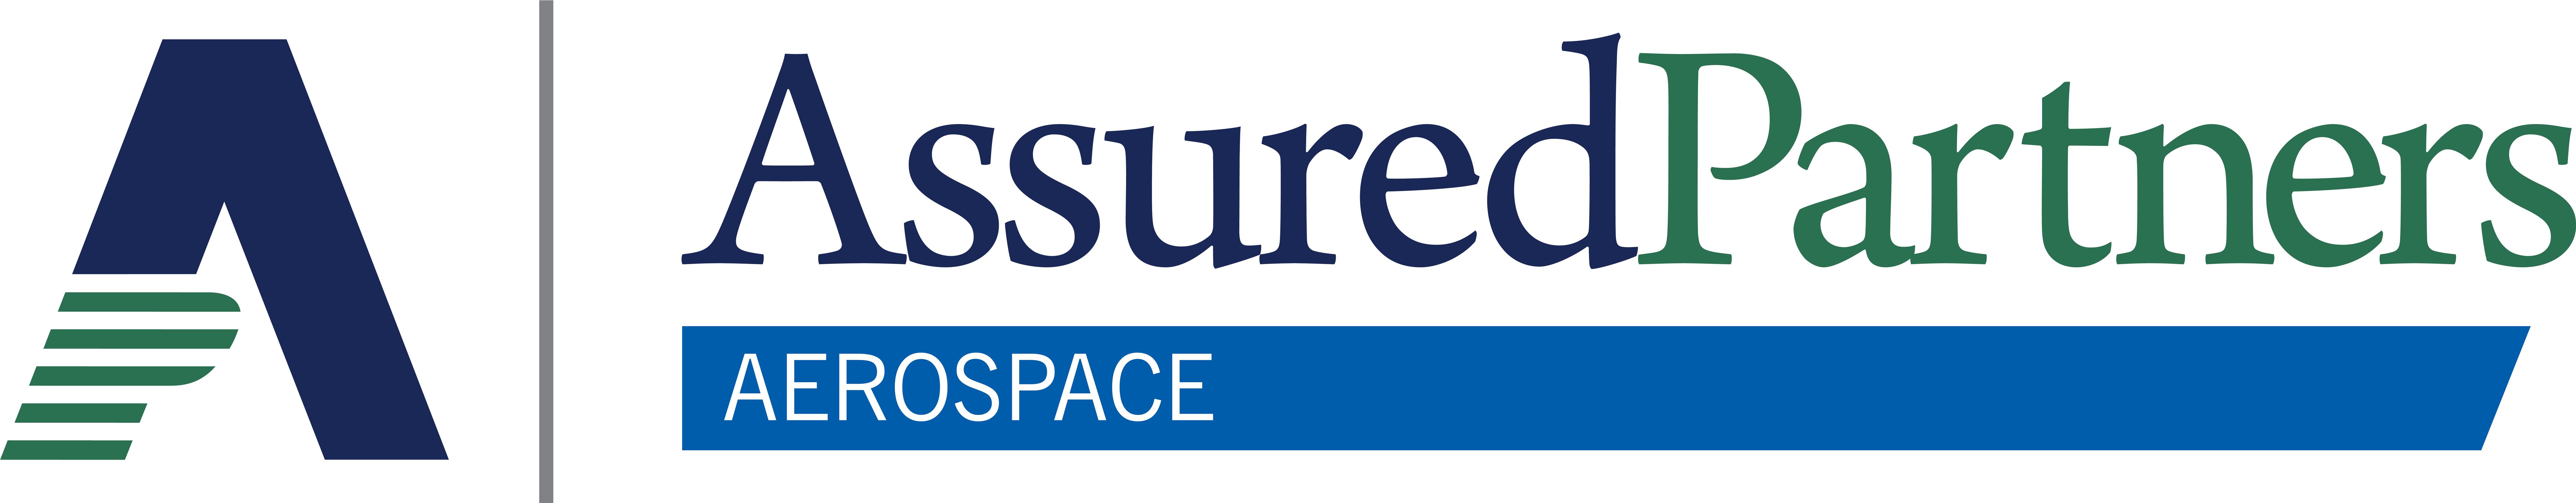 AssuredPartners Aerospace logo